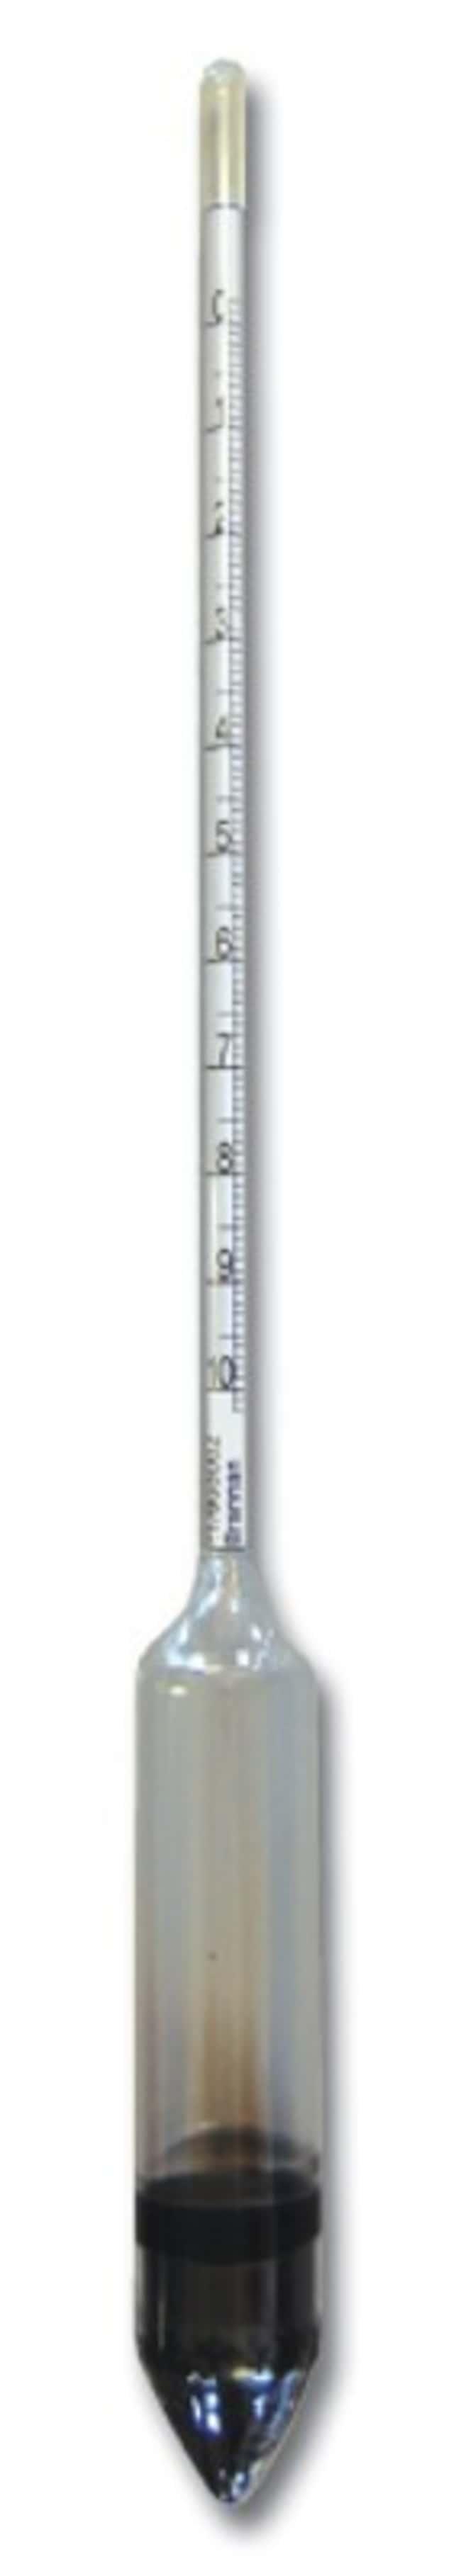 Brannan™Baumé Hydrometer Brannan Baume Hydrometer – Bereich: 0 bis 50Grad Brannan™Baumé Hydrometer